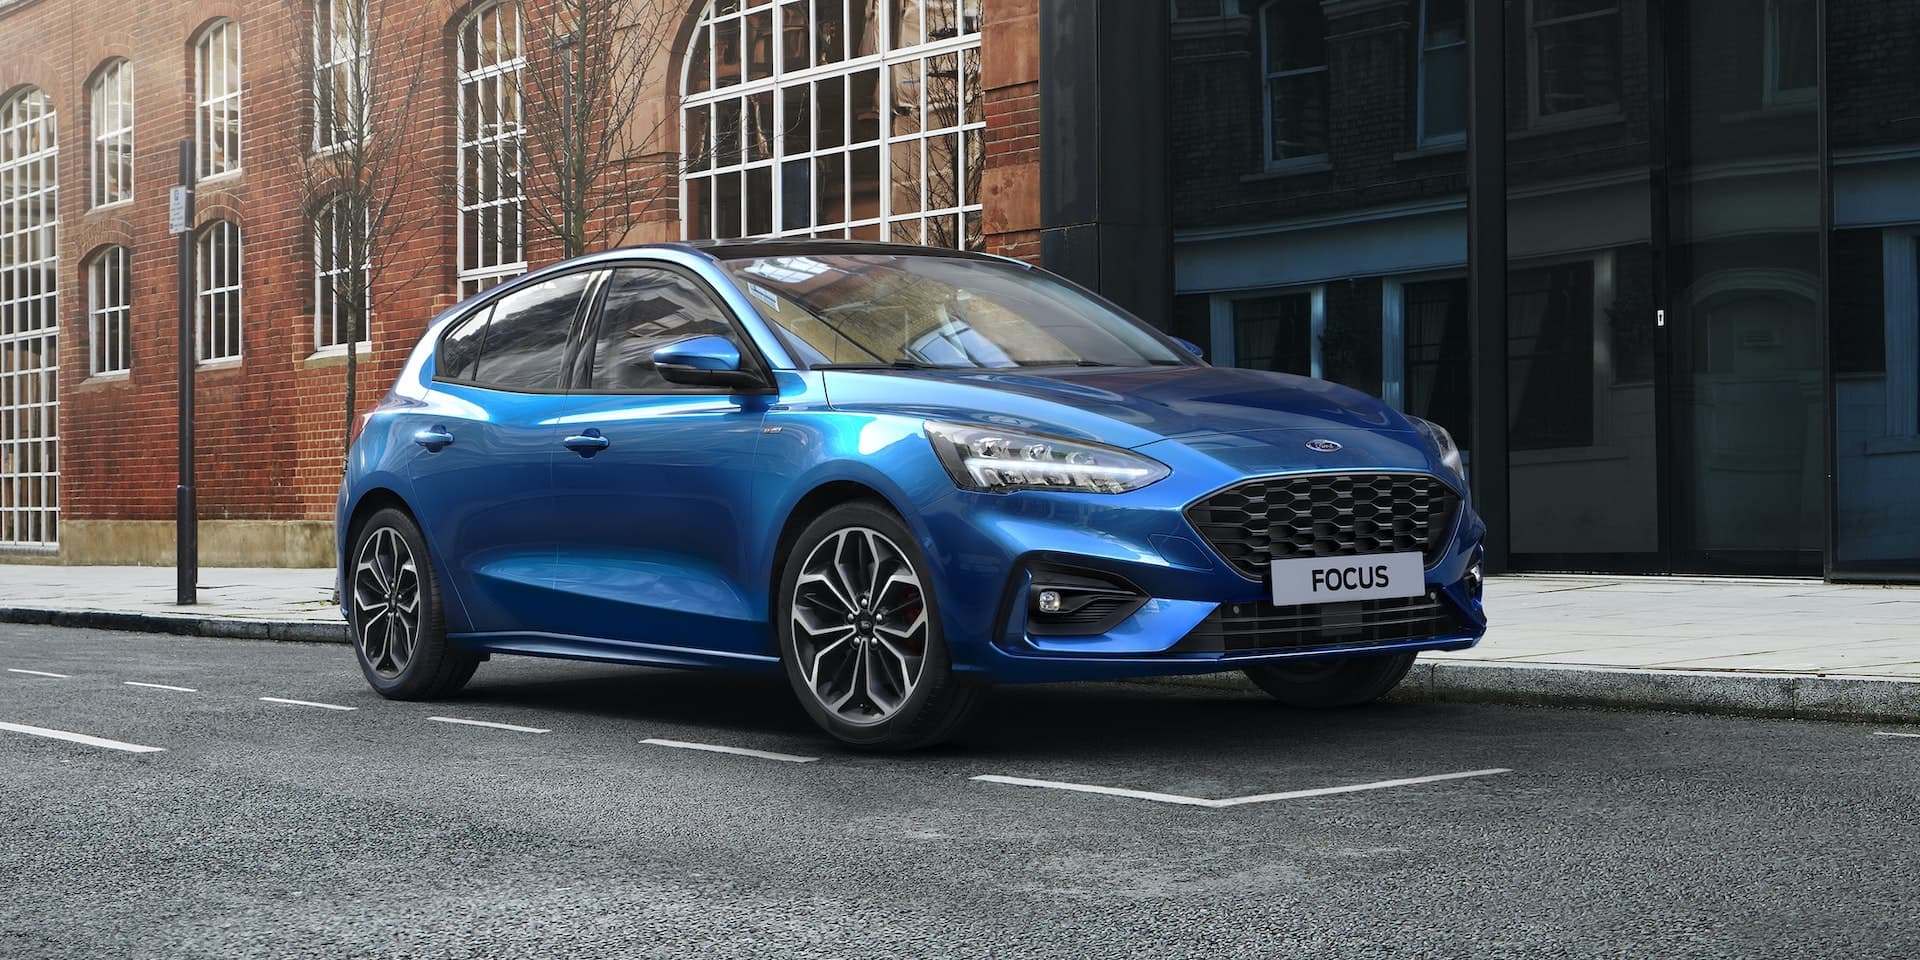 2020 Ford Focus gets mild hybrid power